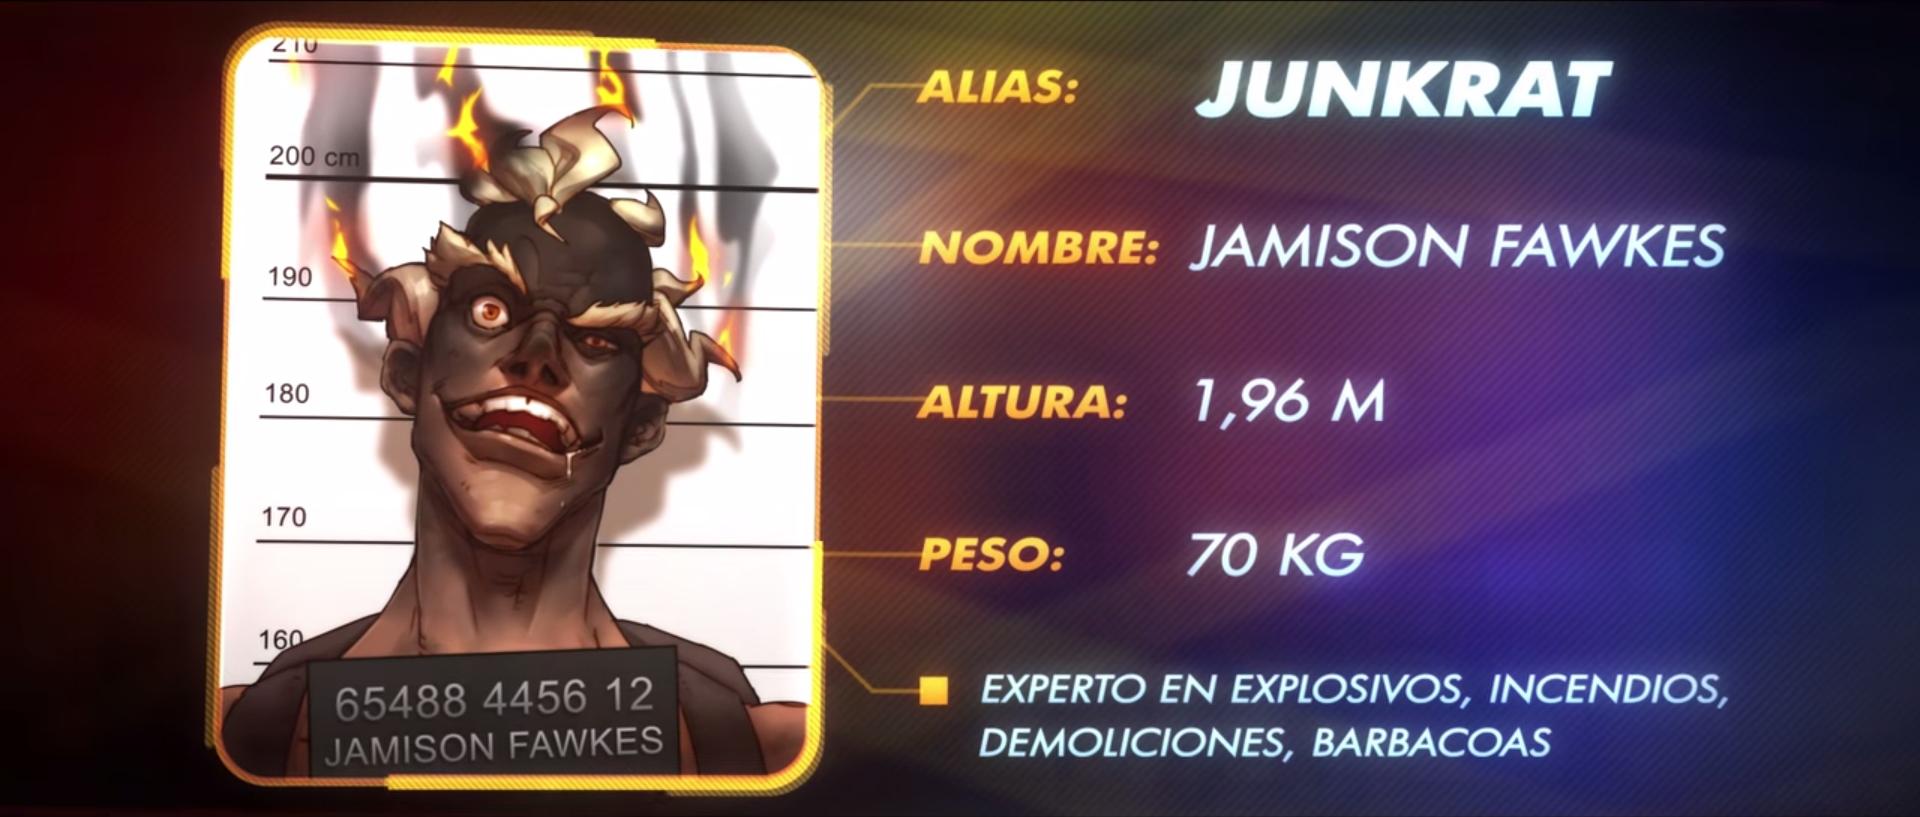 Junkrat Trailer Español